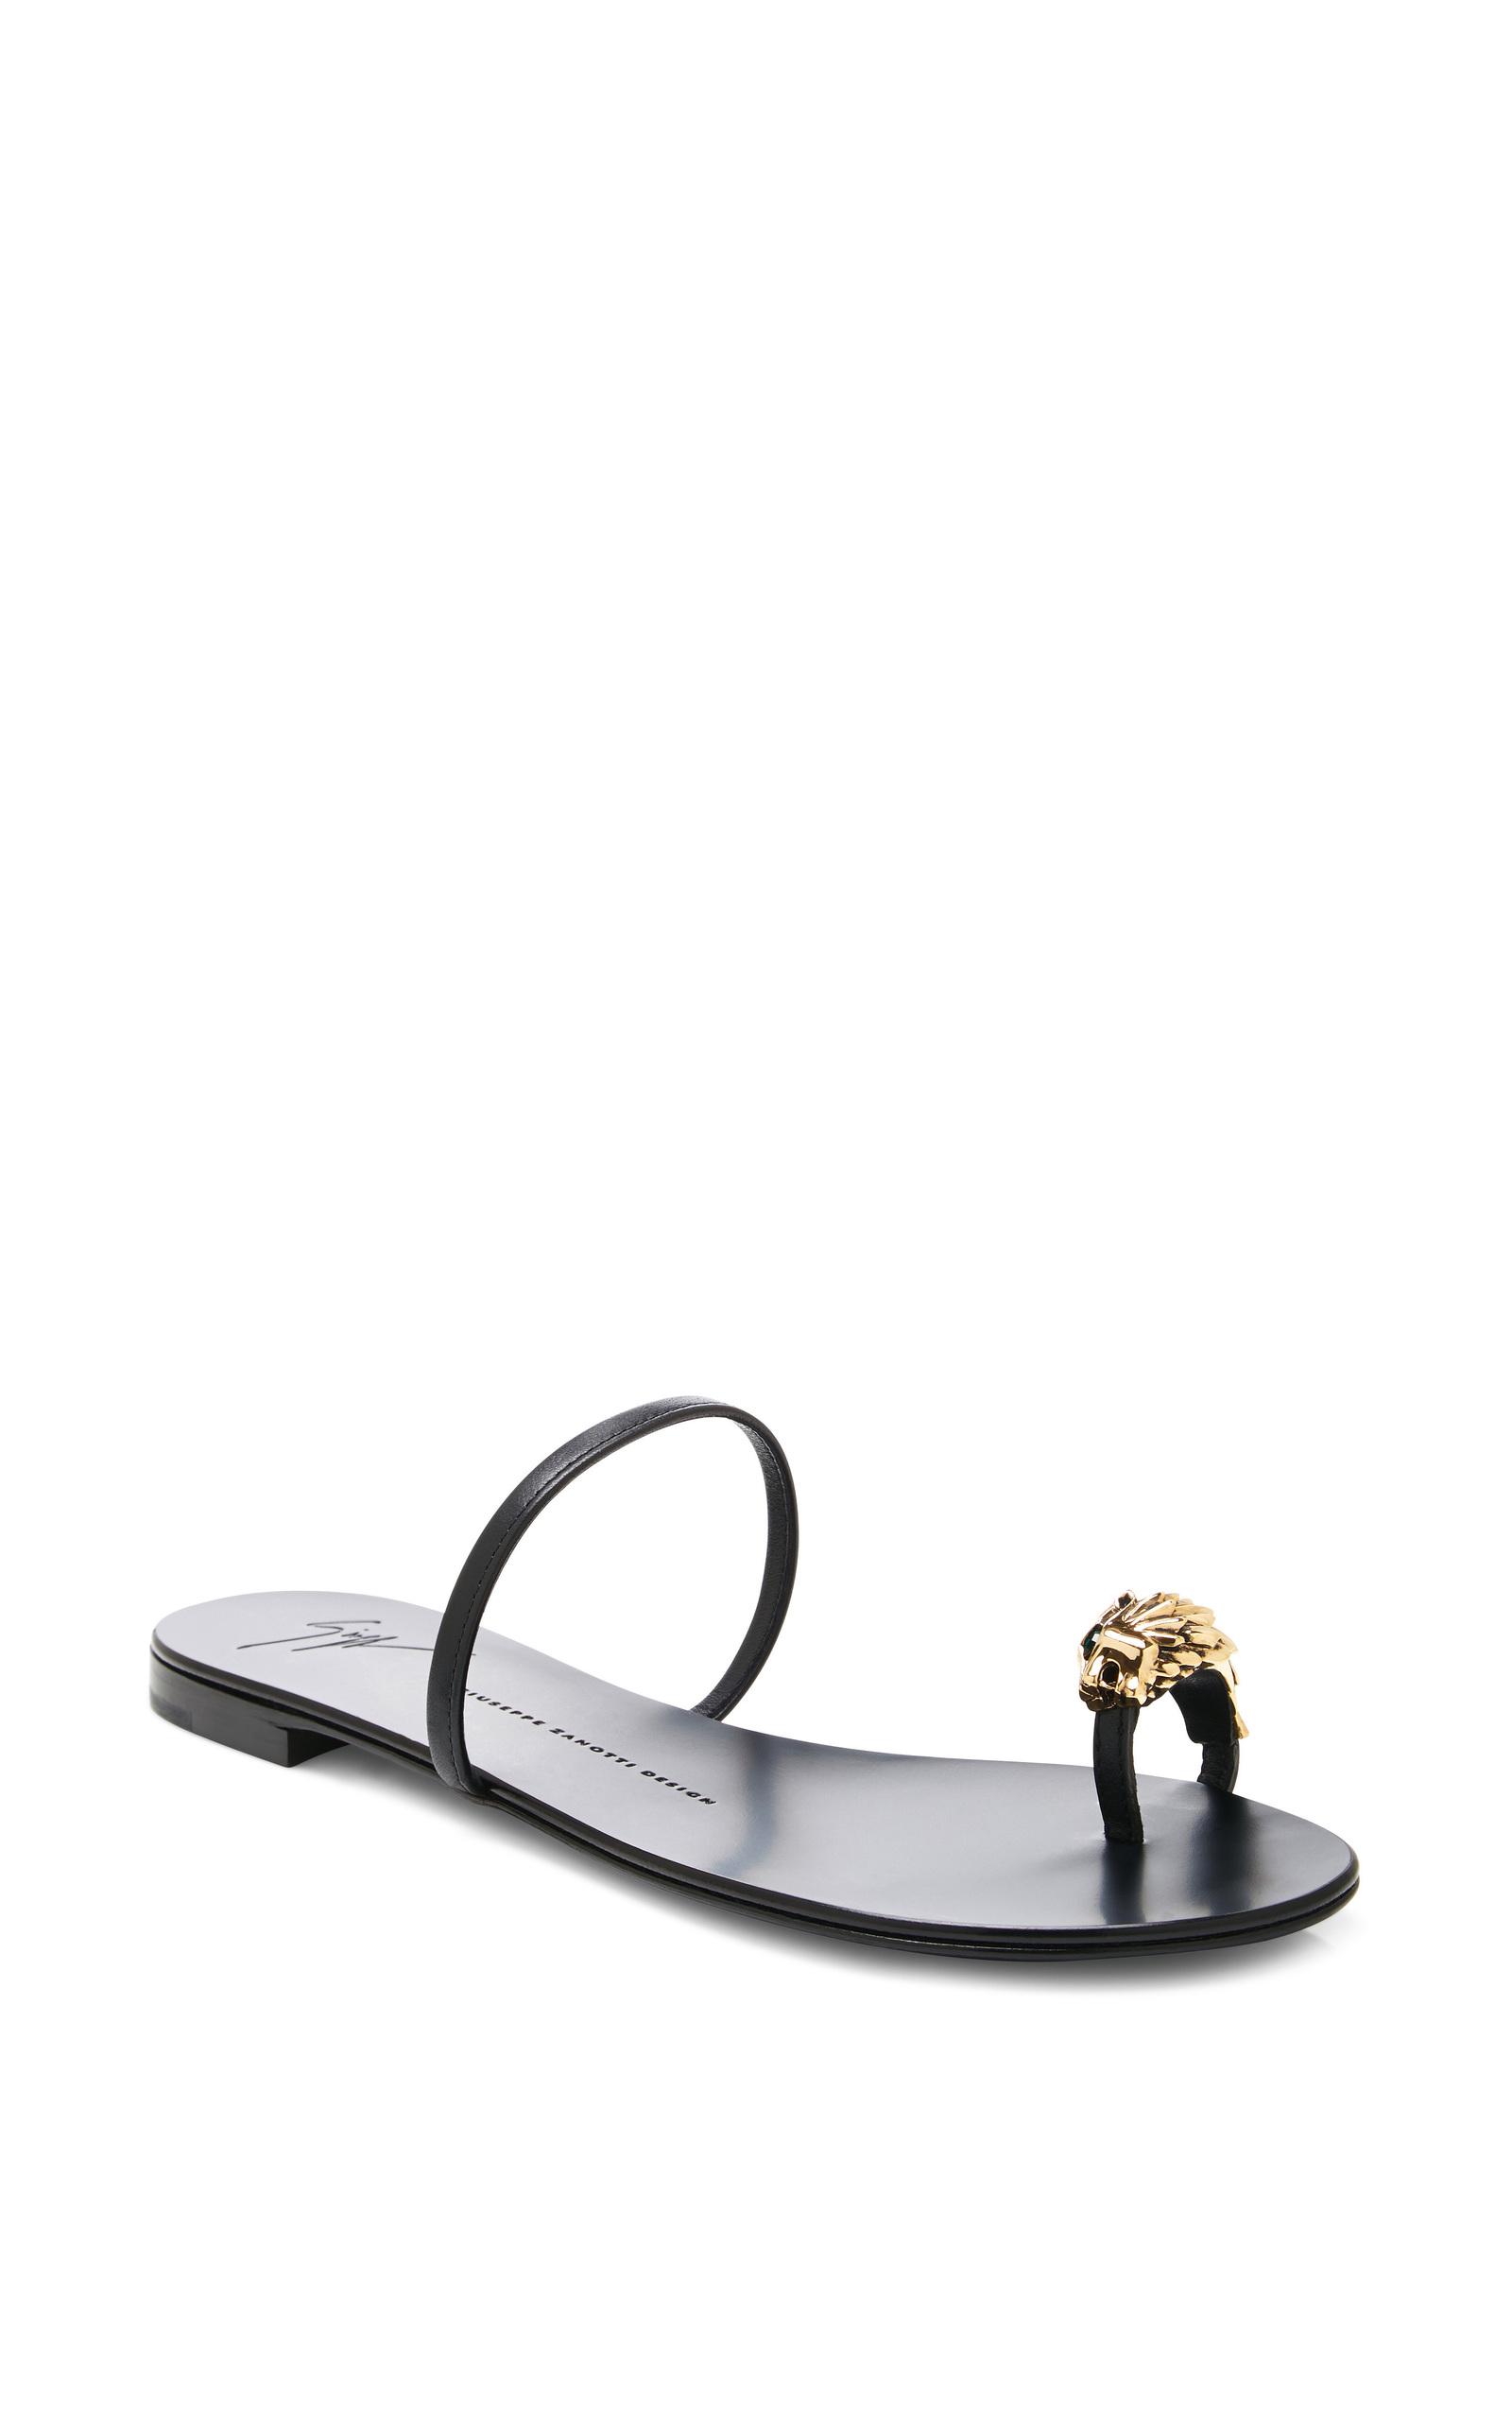 86d4a0f5992eb Giuseppe Zanotti Rock Lion-head Leather Sandals in Black - Lyst